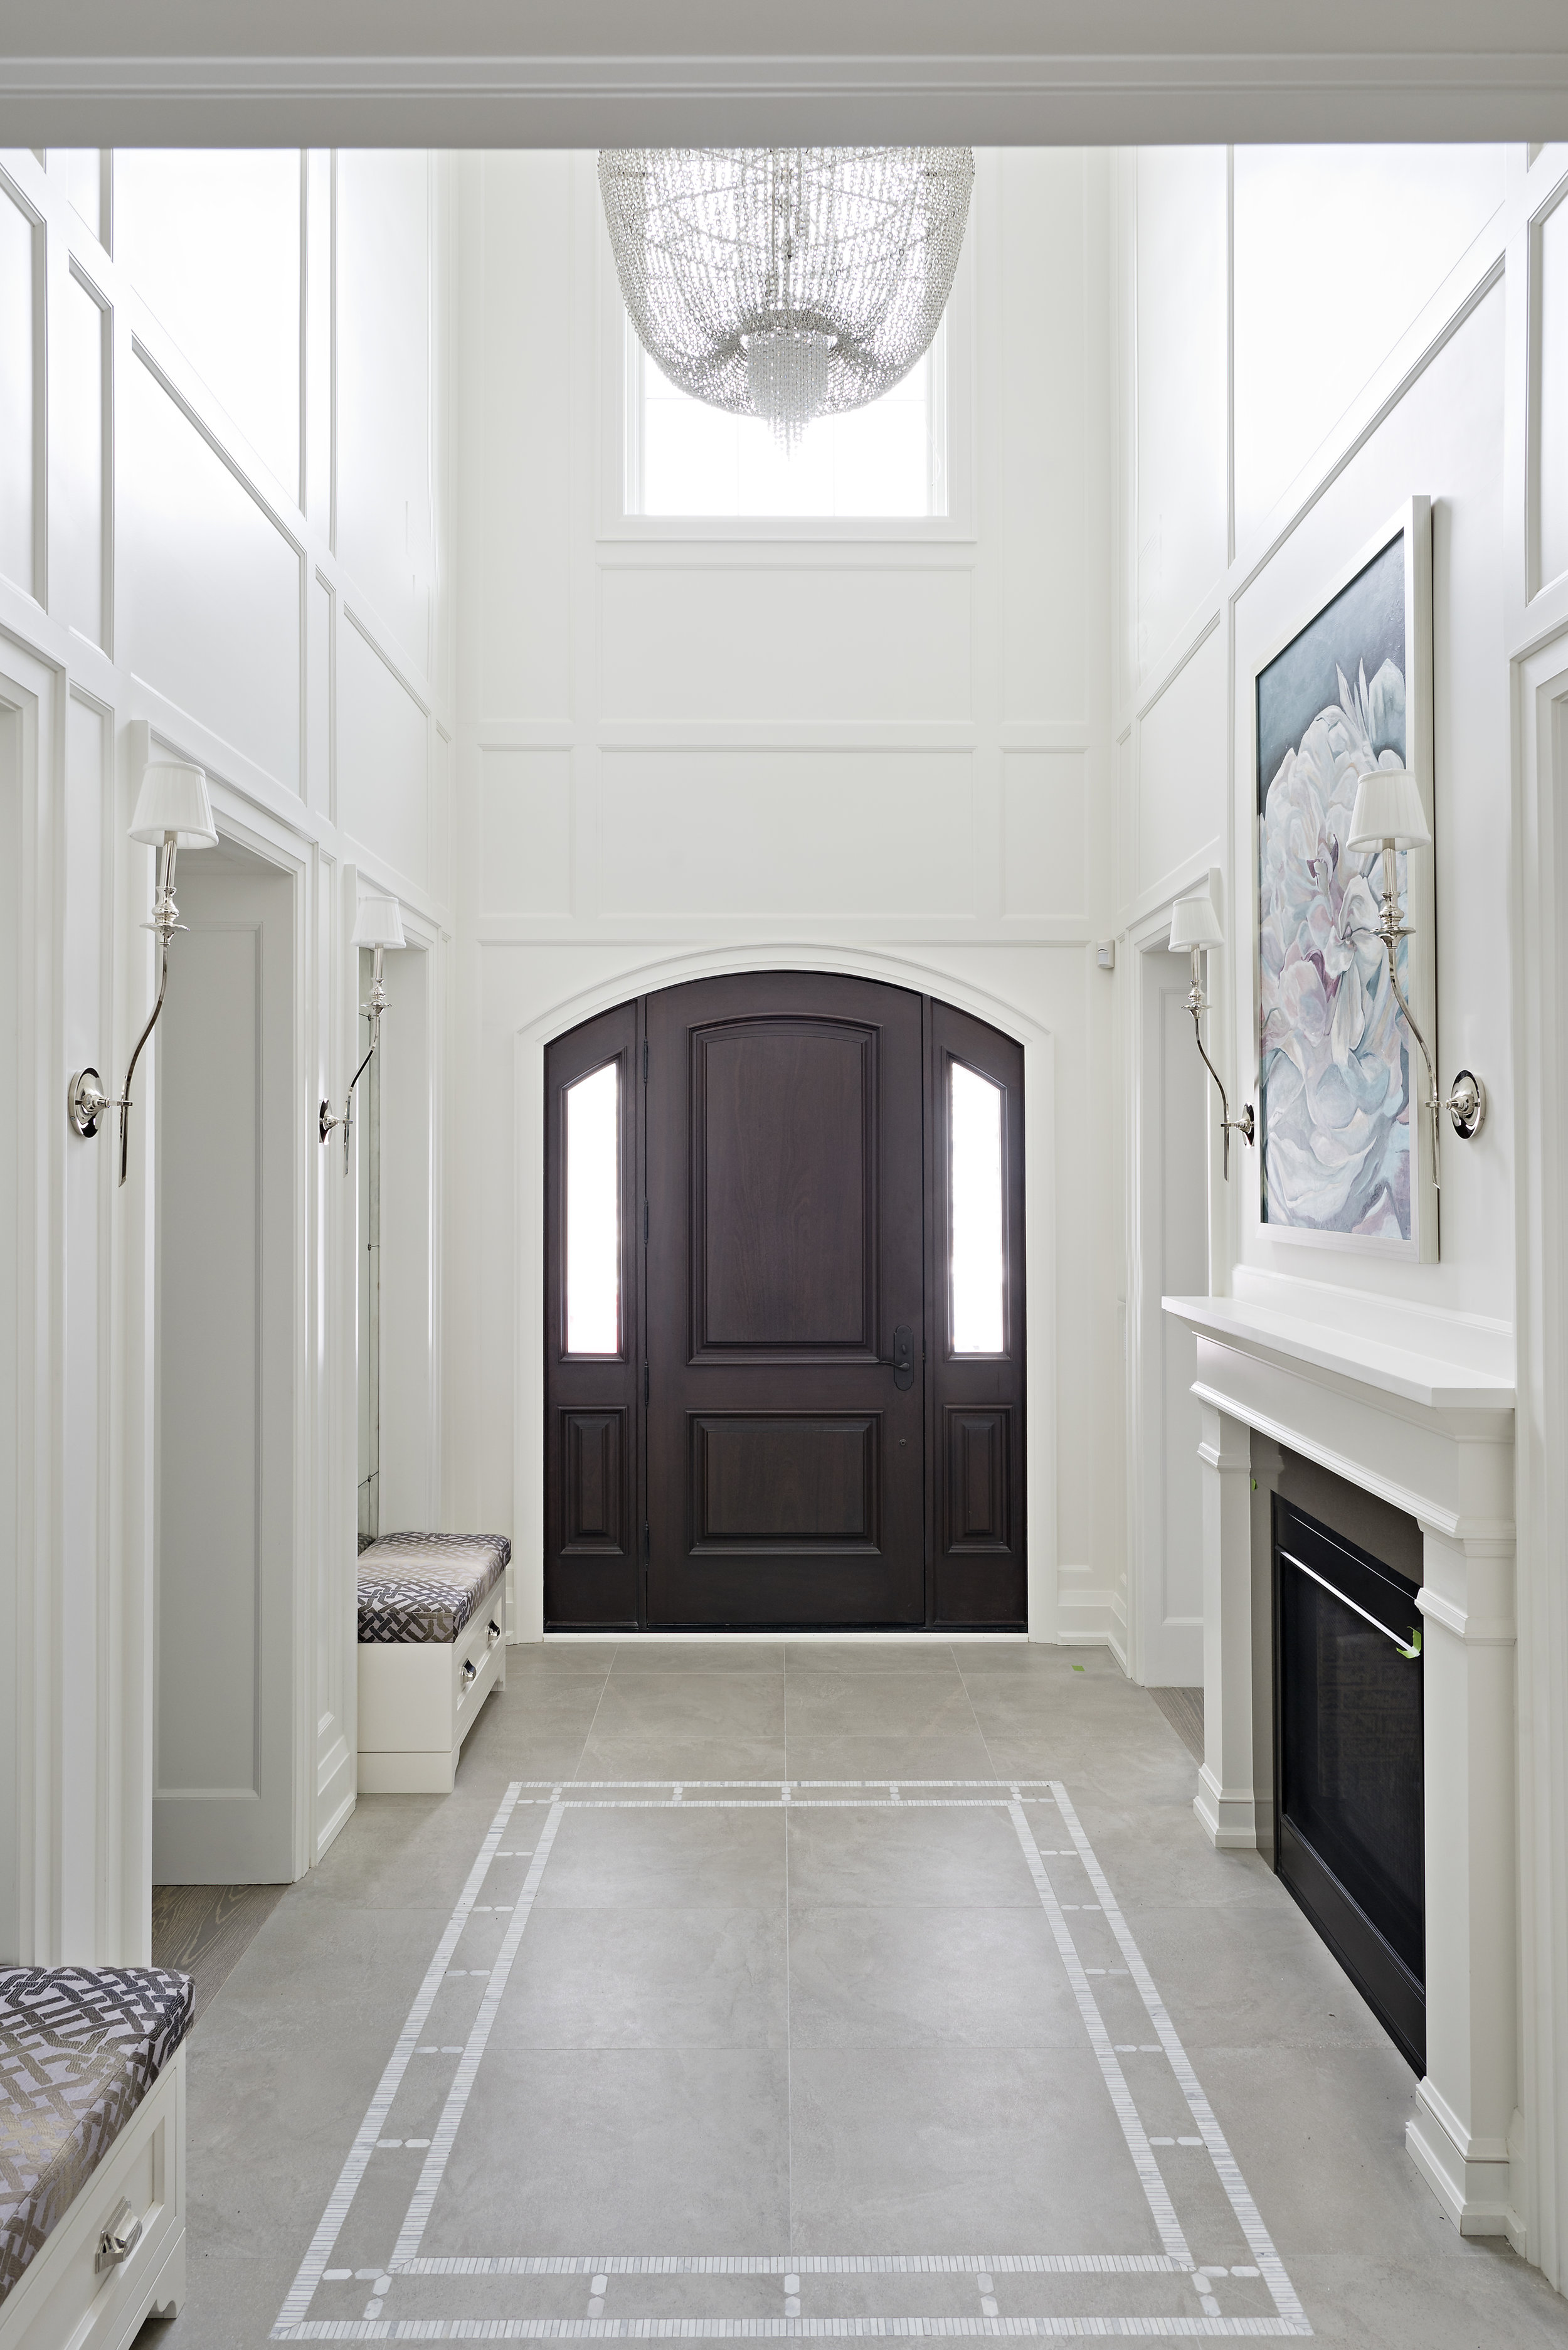 Interior Designer Pizzale Design Front Entrance Hall Custom Floor Inlay Tile Fireplace White.jpg